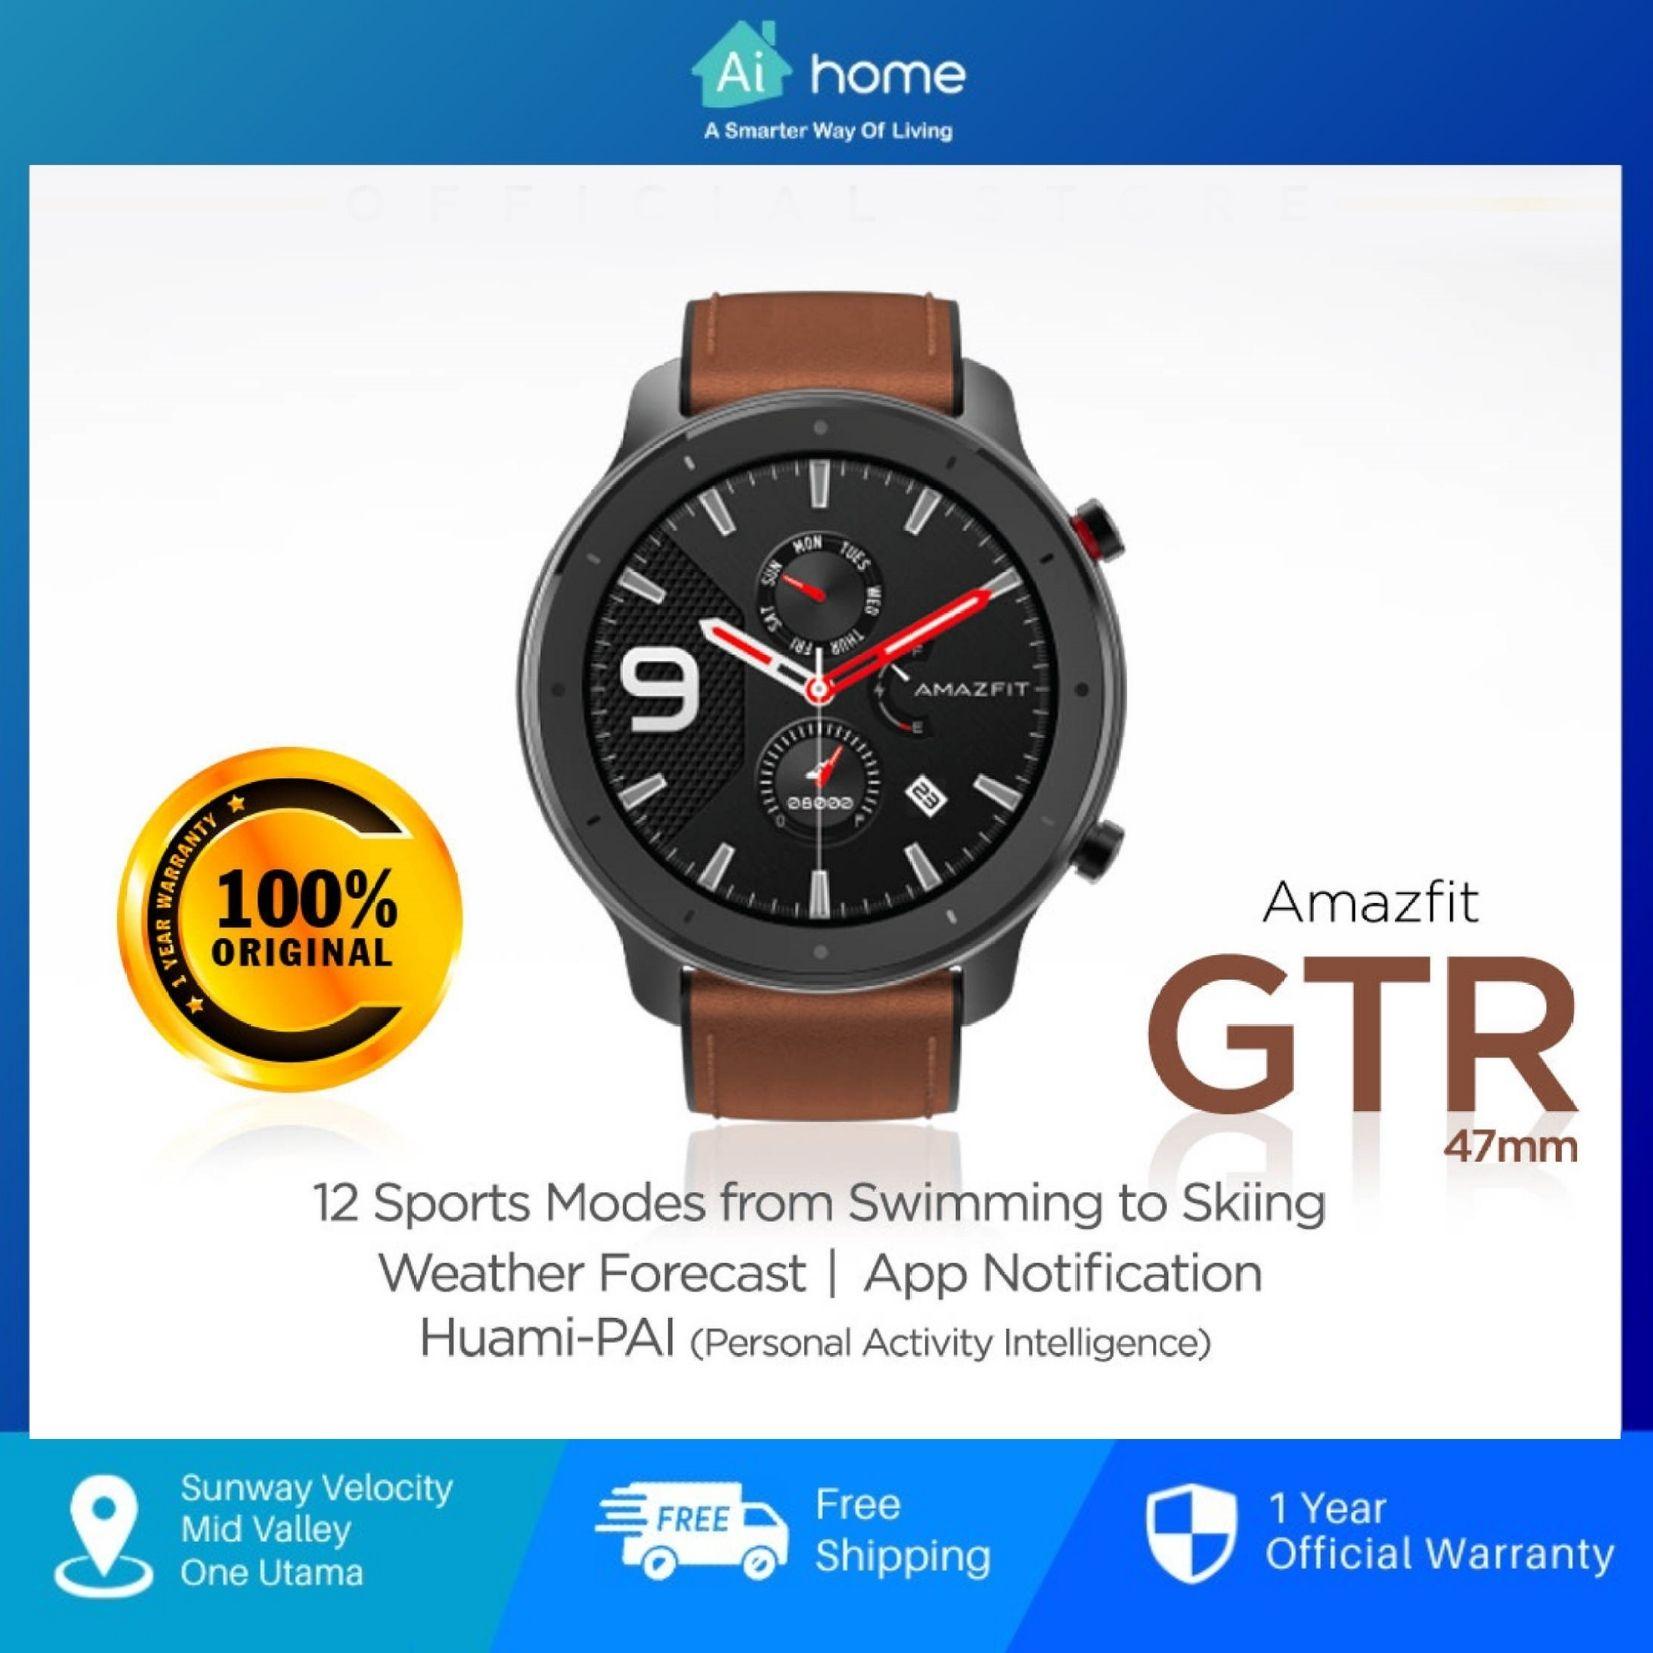 HUAMI AMAZFIT GTR 47mm-A1902 (Aluminium Alloy) [ Smart Watch ] [ Ai Home ]